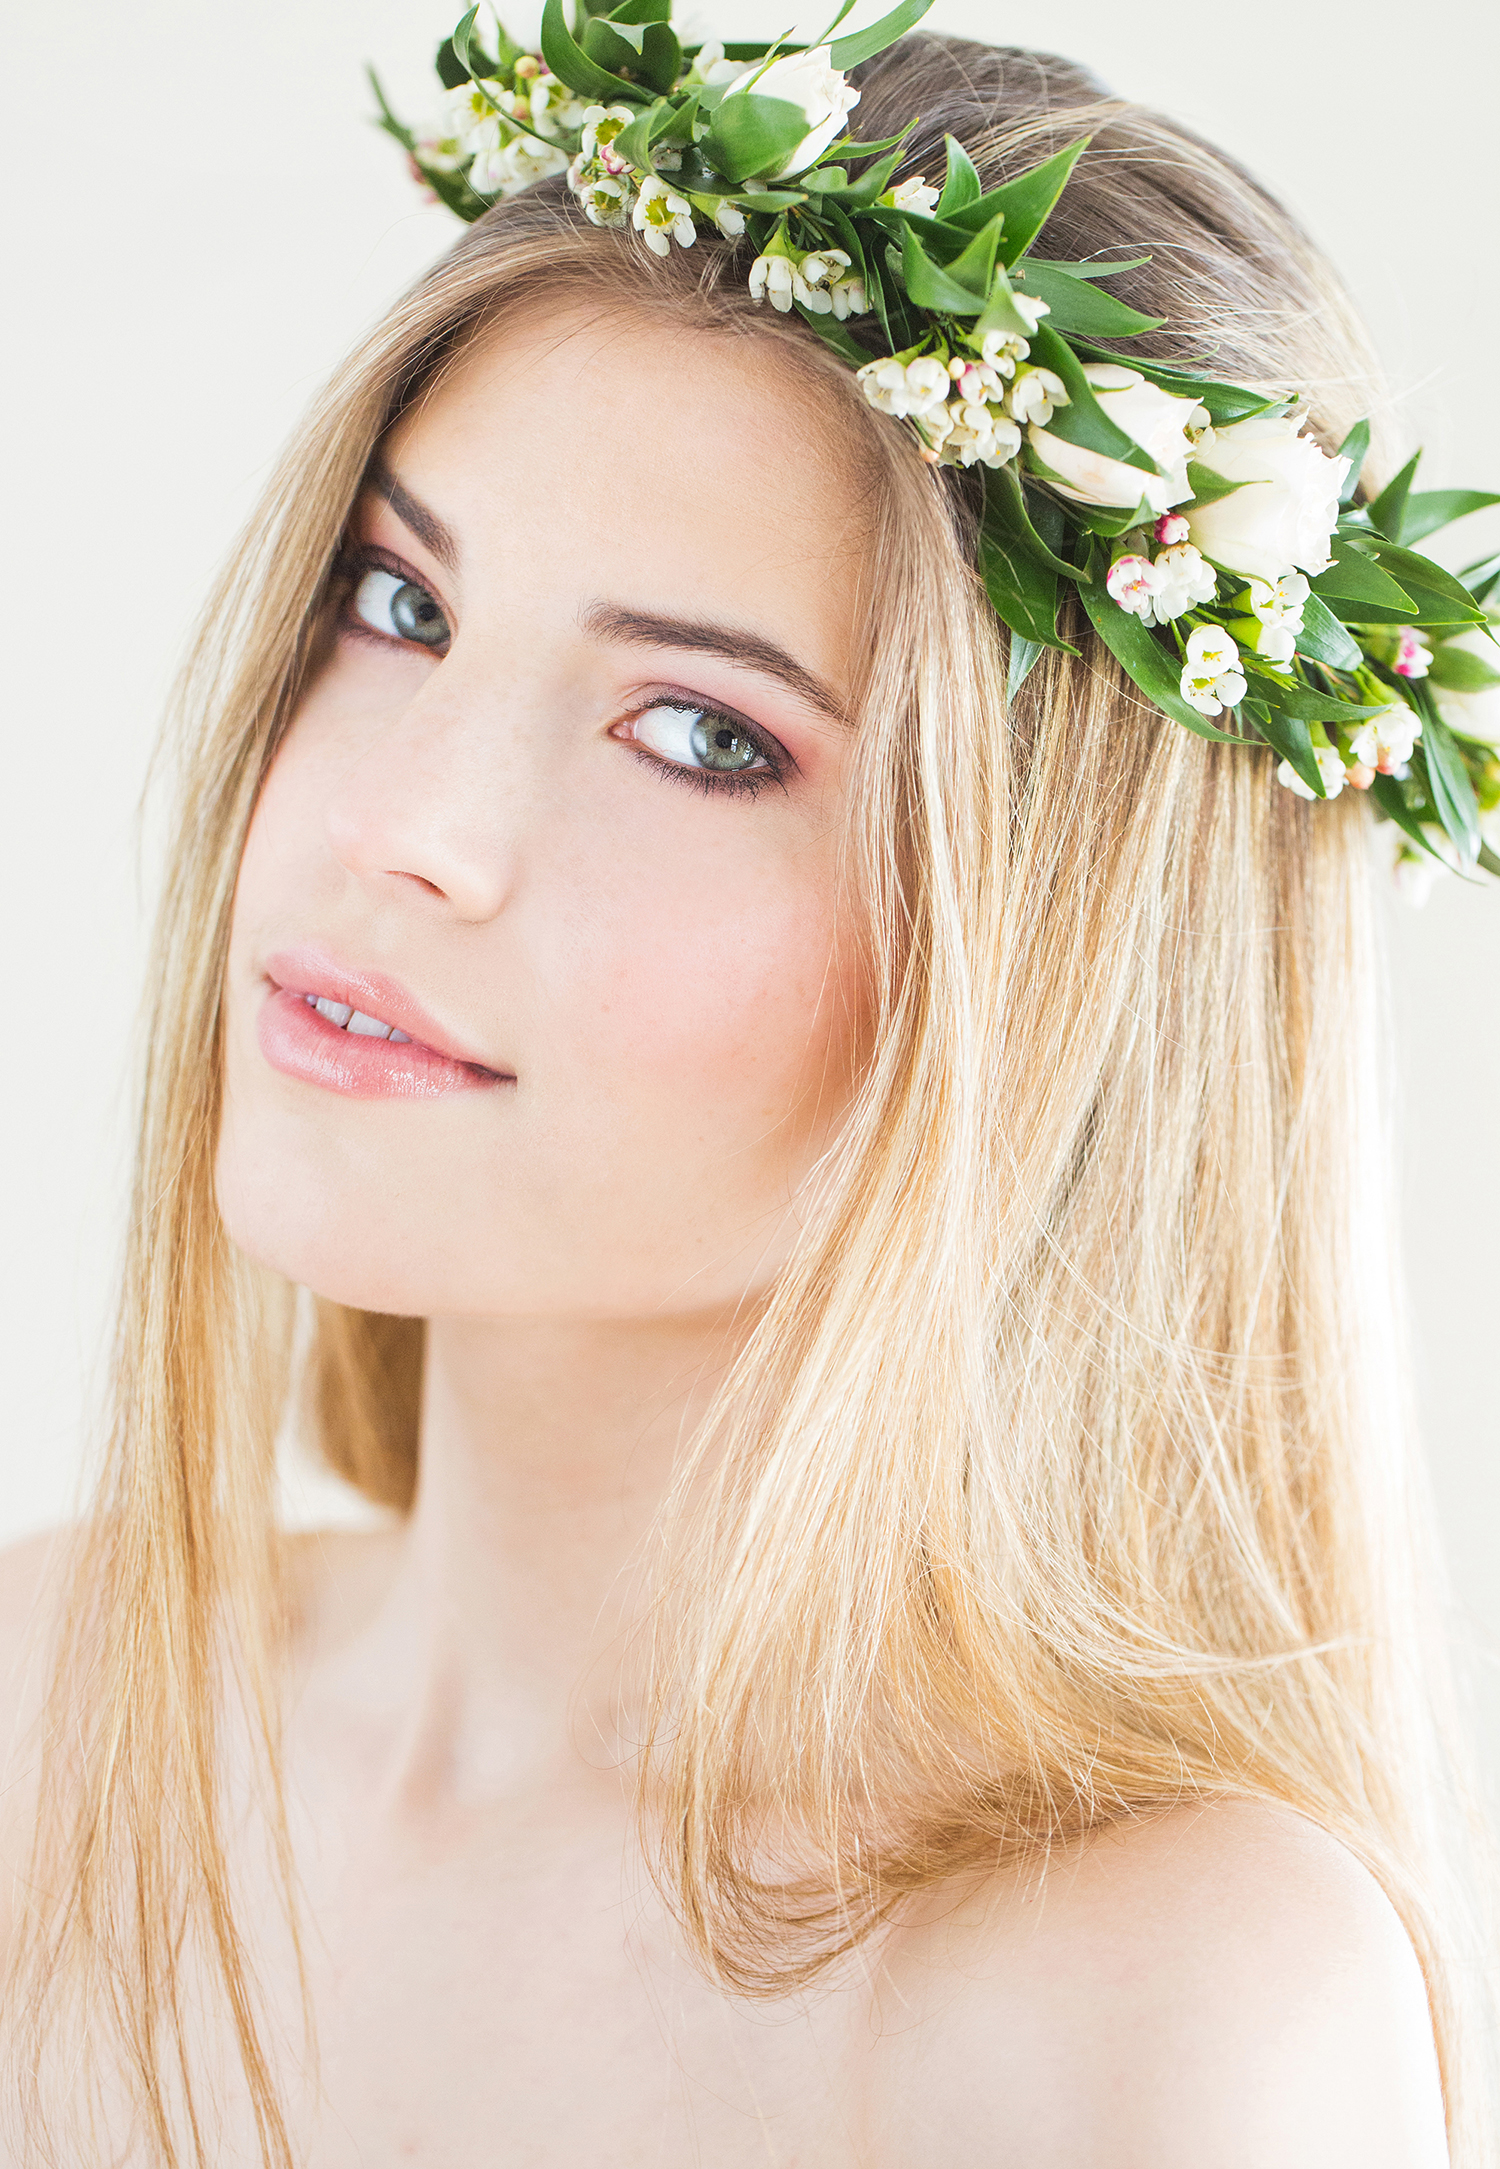 BeautyPhotography_Michelle GirardPhotography12.jpg